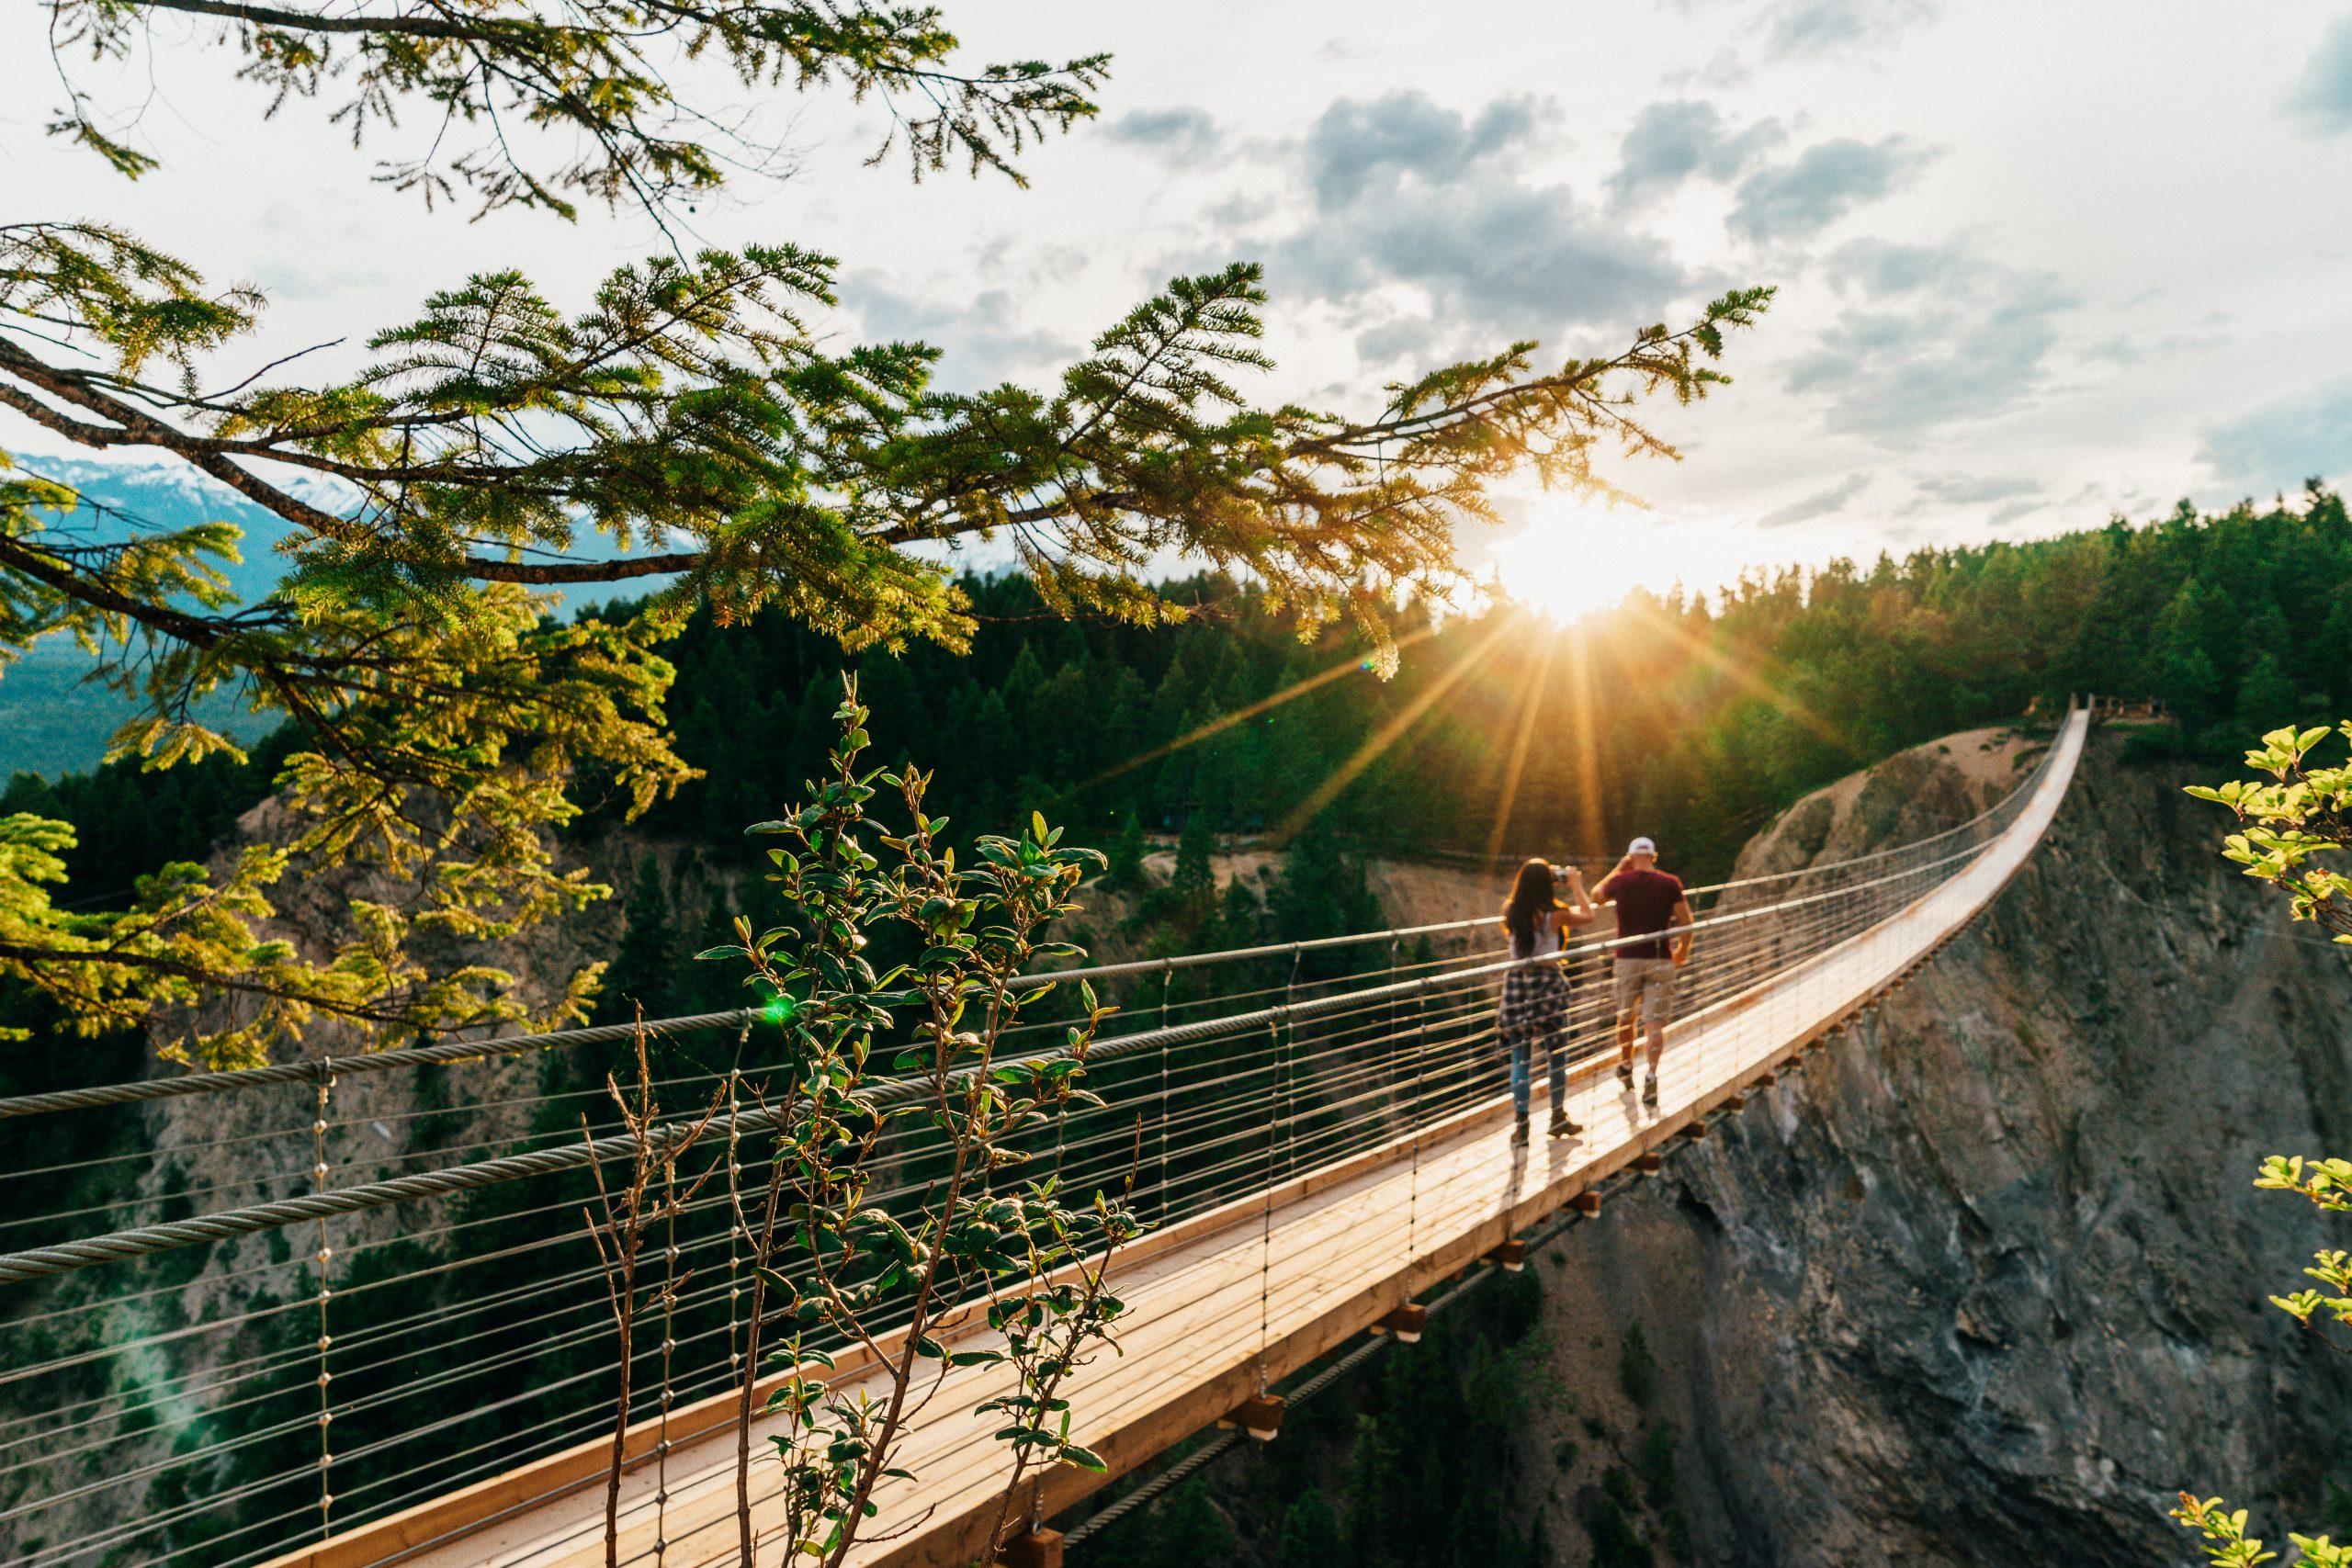 Golden Skybridge, Pursuit Collection, BC Canada